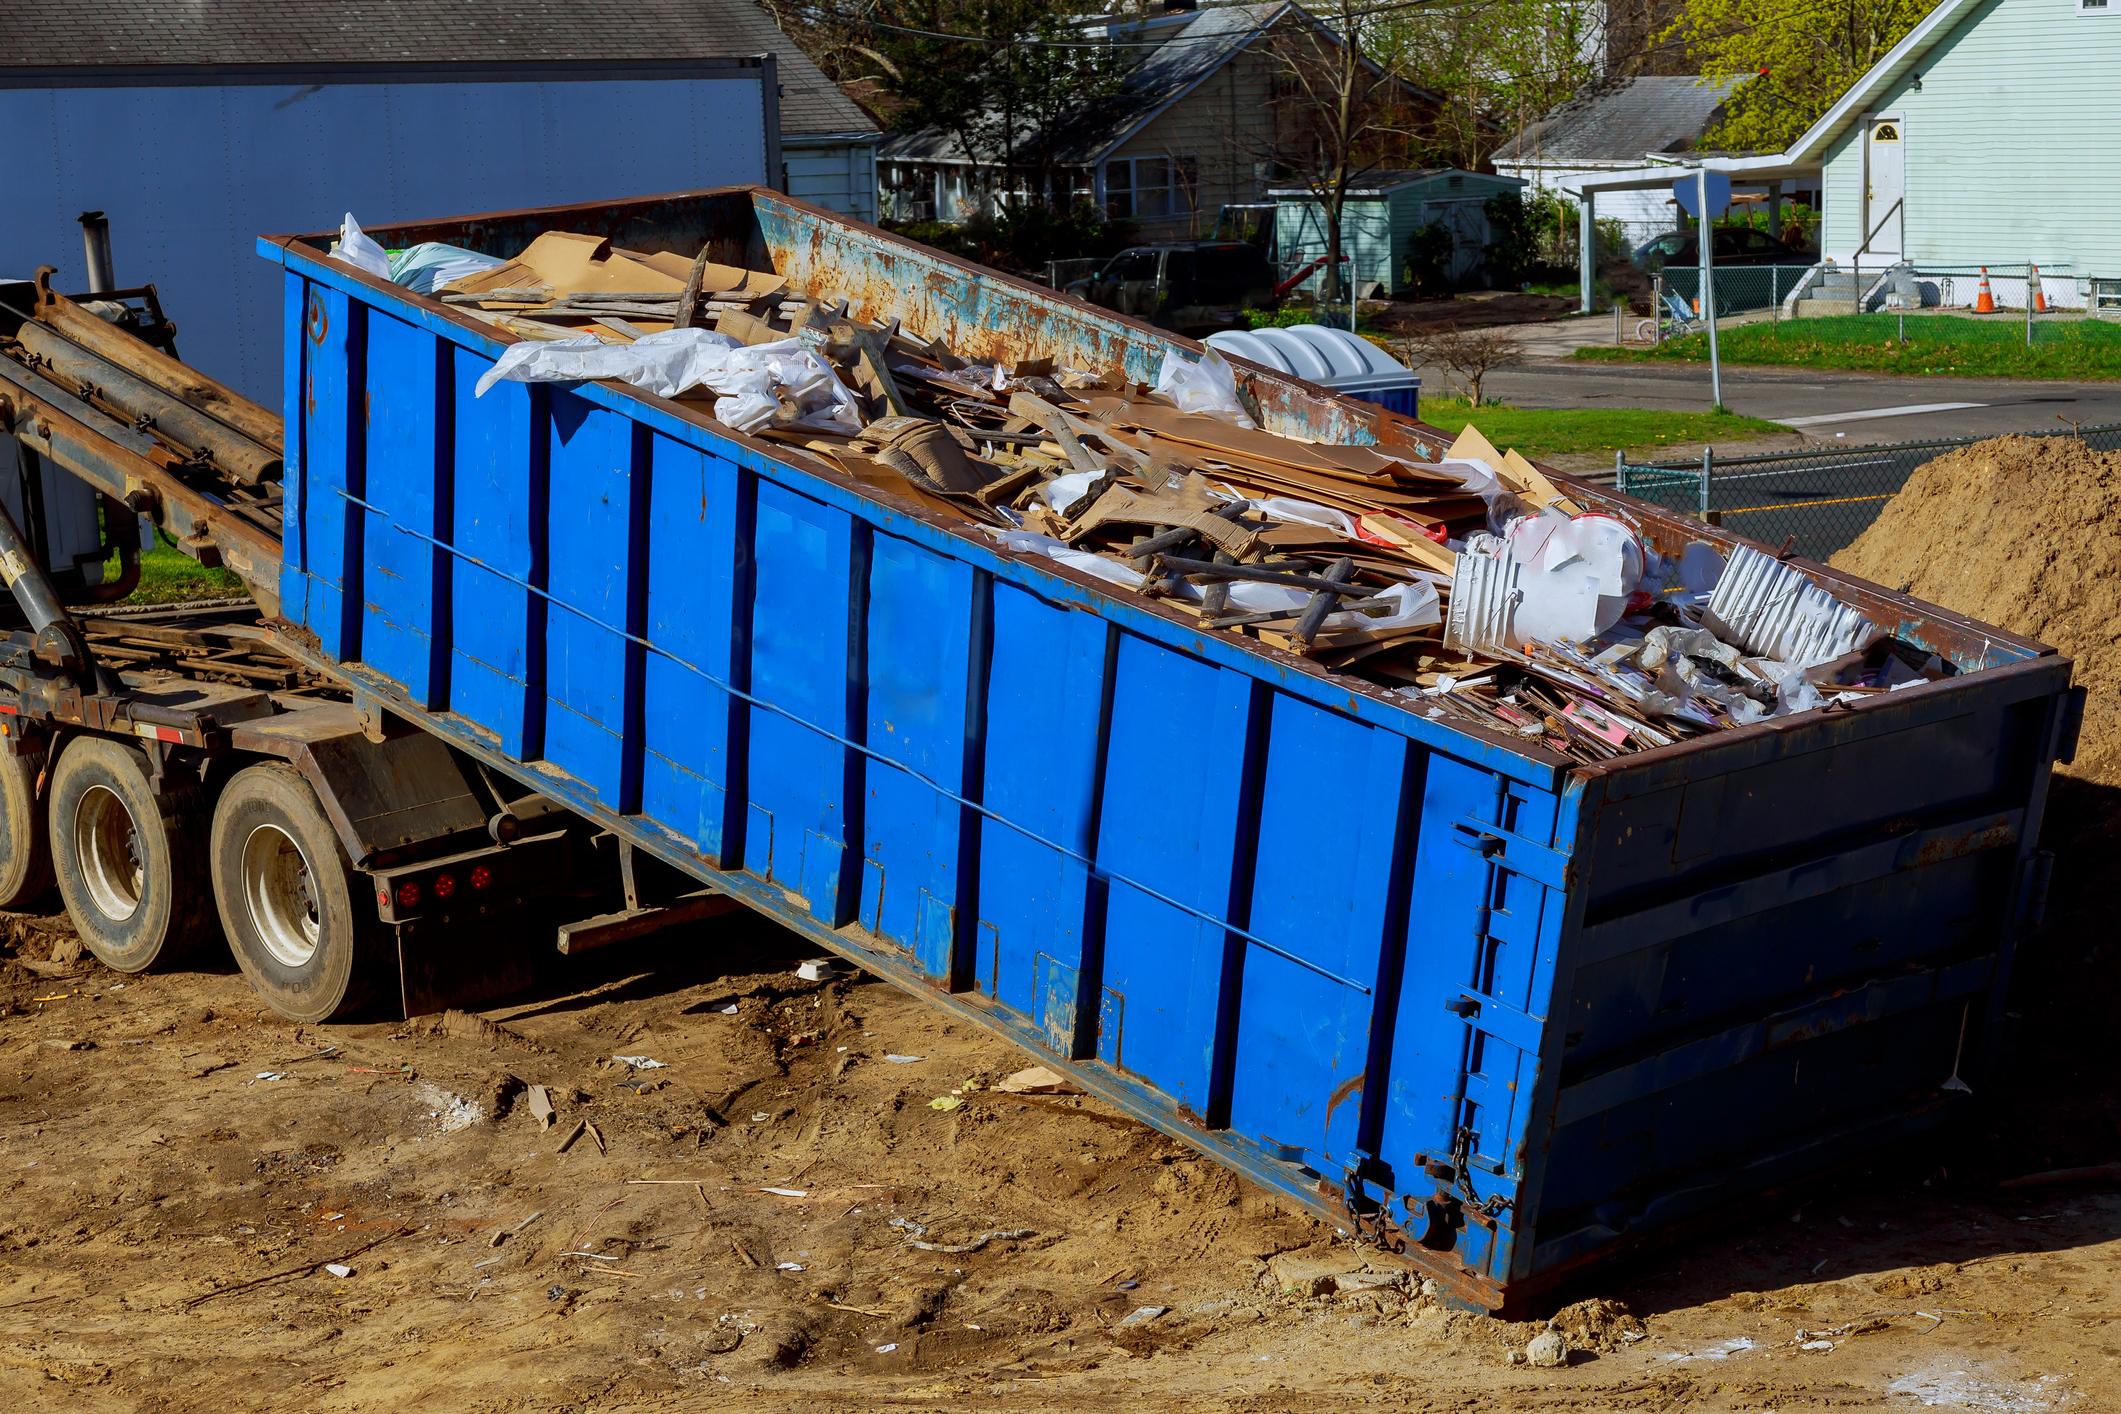 blue roll-off dumpster full of junk